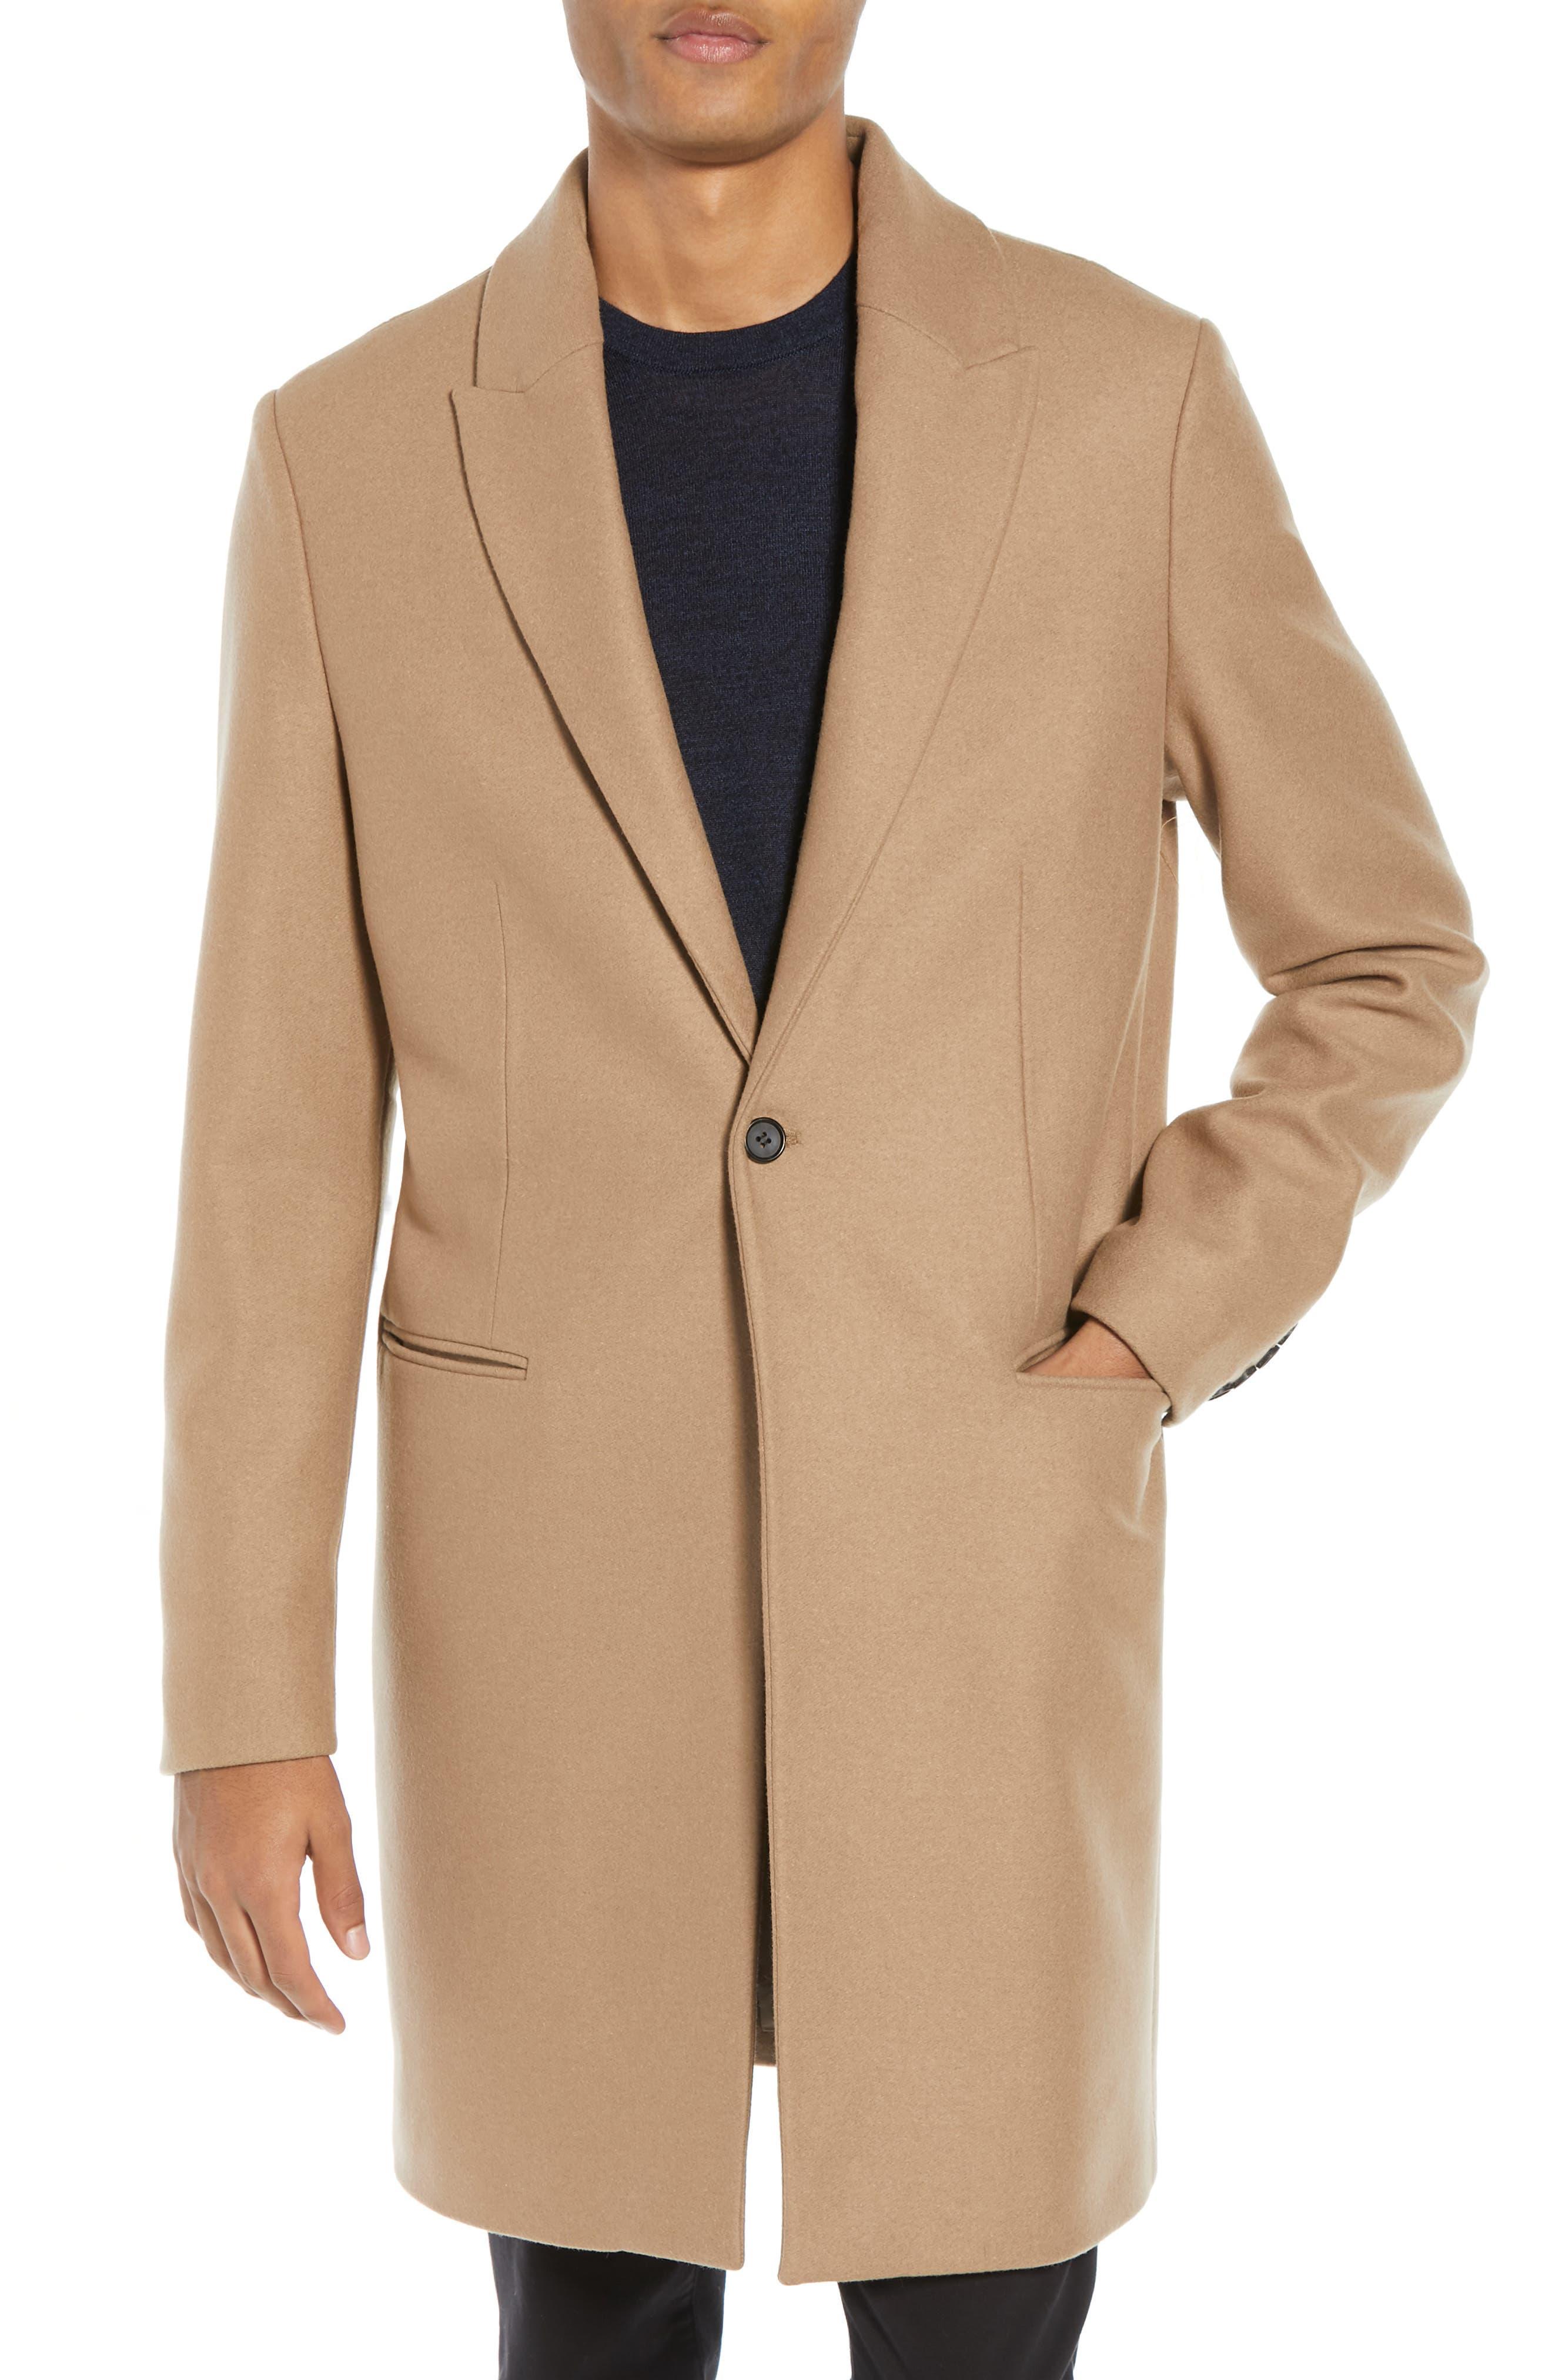 Tulsen Regular Fit Wool Topcoat,                             Alternate thumbnail 4, color,                             200